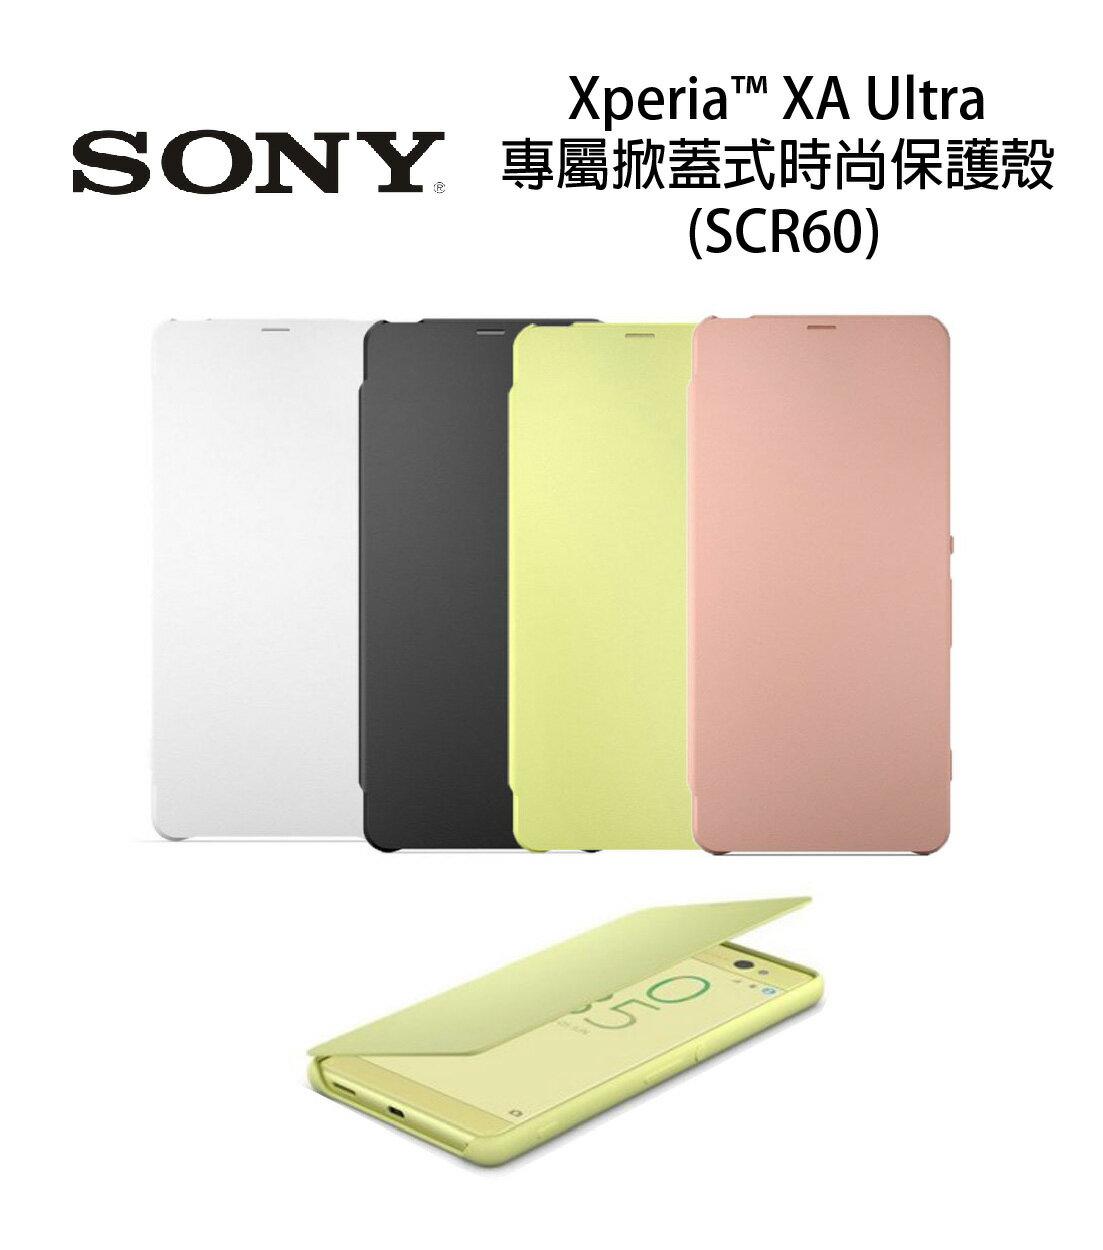 SONY Xperia™ XA Ultra專用原廠側翻皮套 SCR60 《石墨灰/萊姆金/白》